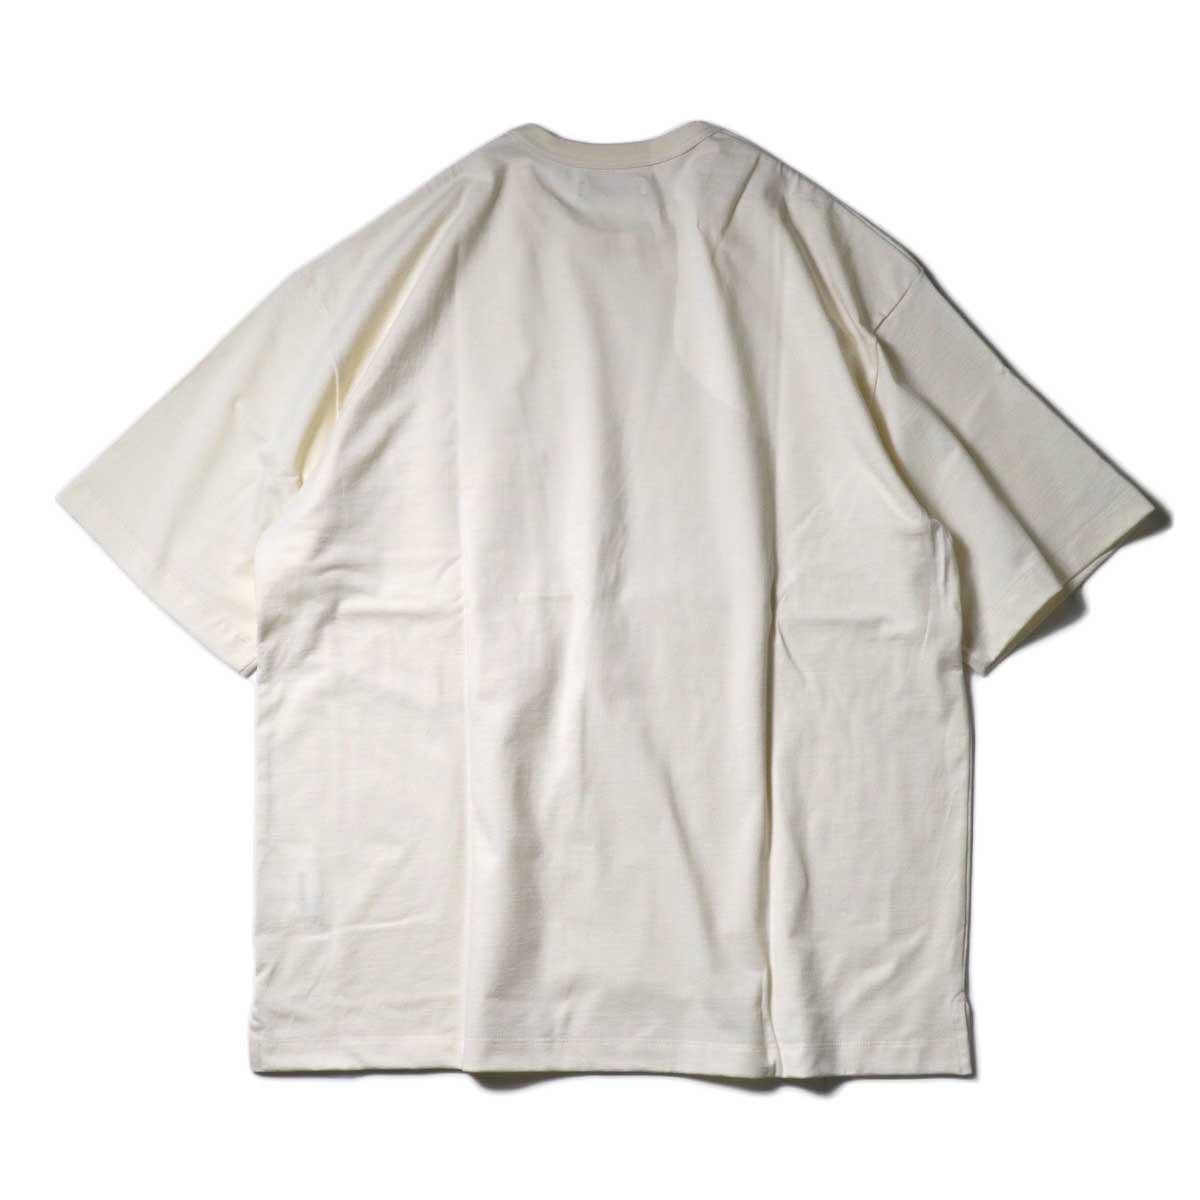 alvana / Tanguis Wide Pocket Tee (Ivory)背面